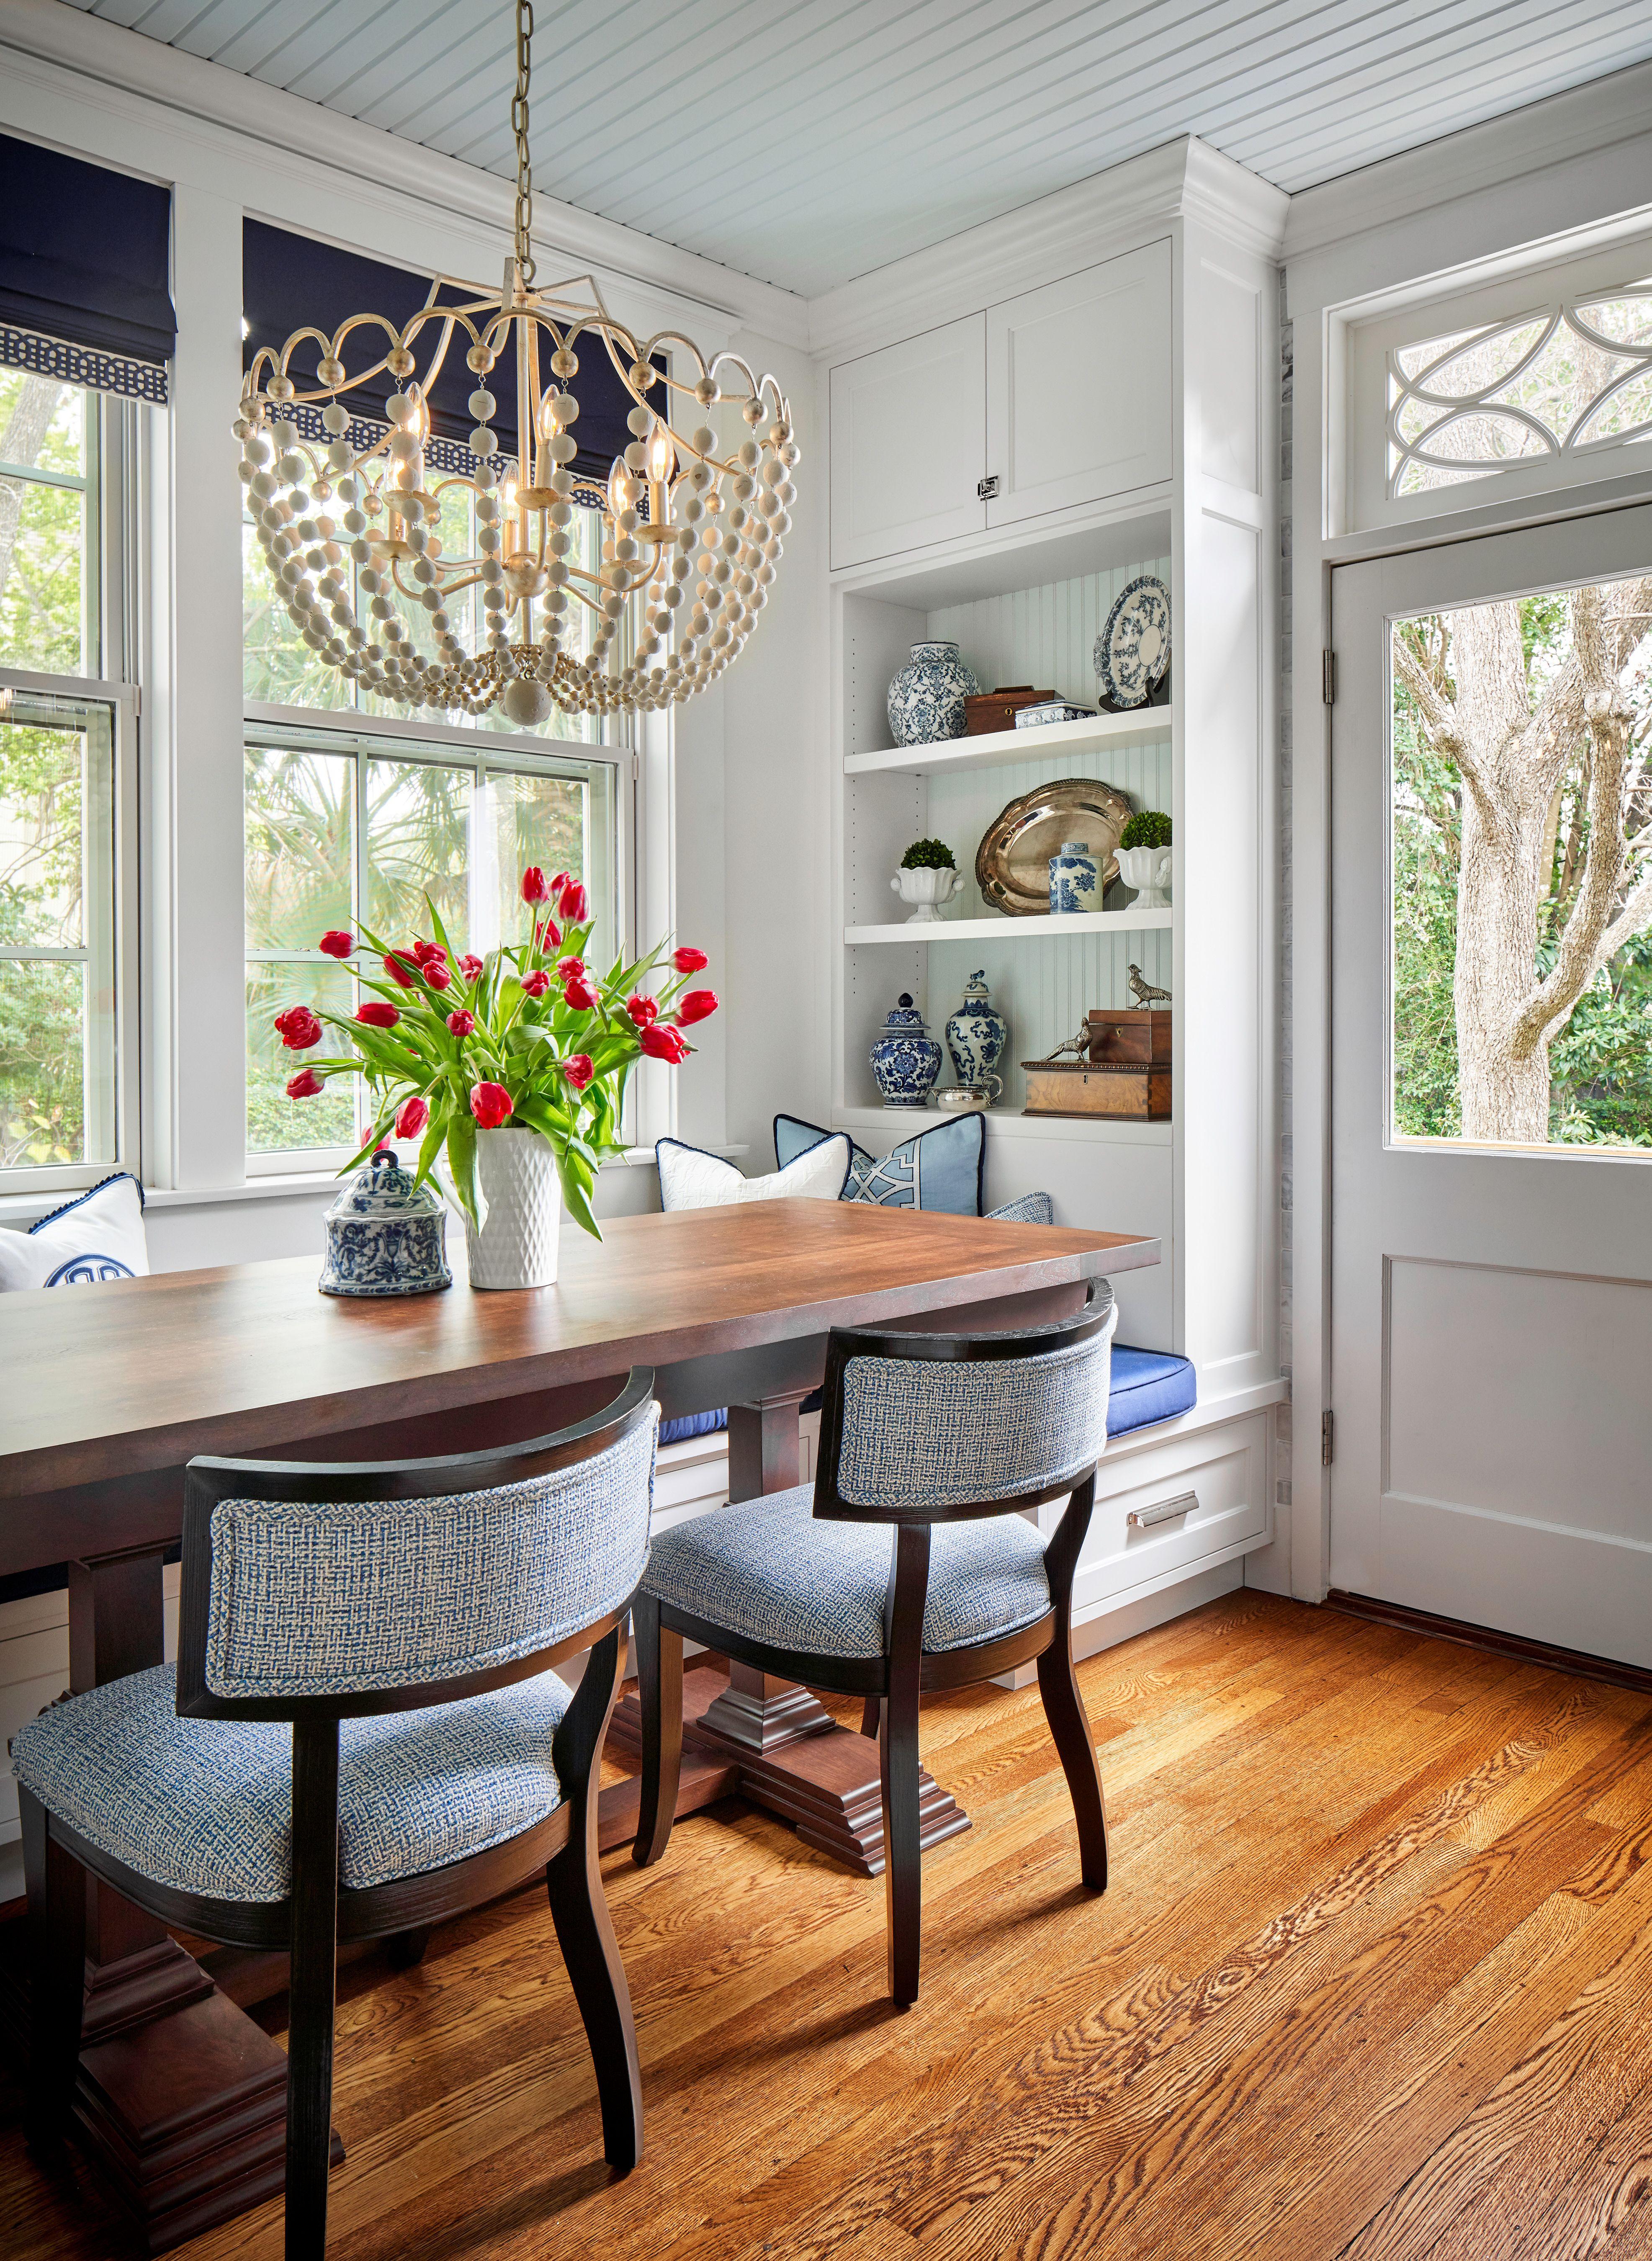 navy and white historic kitchen haven design construction house interior decor cottage on kitchen decor navy id=63693